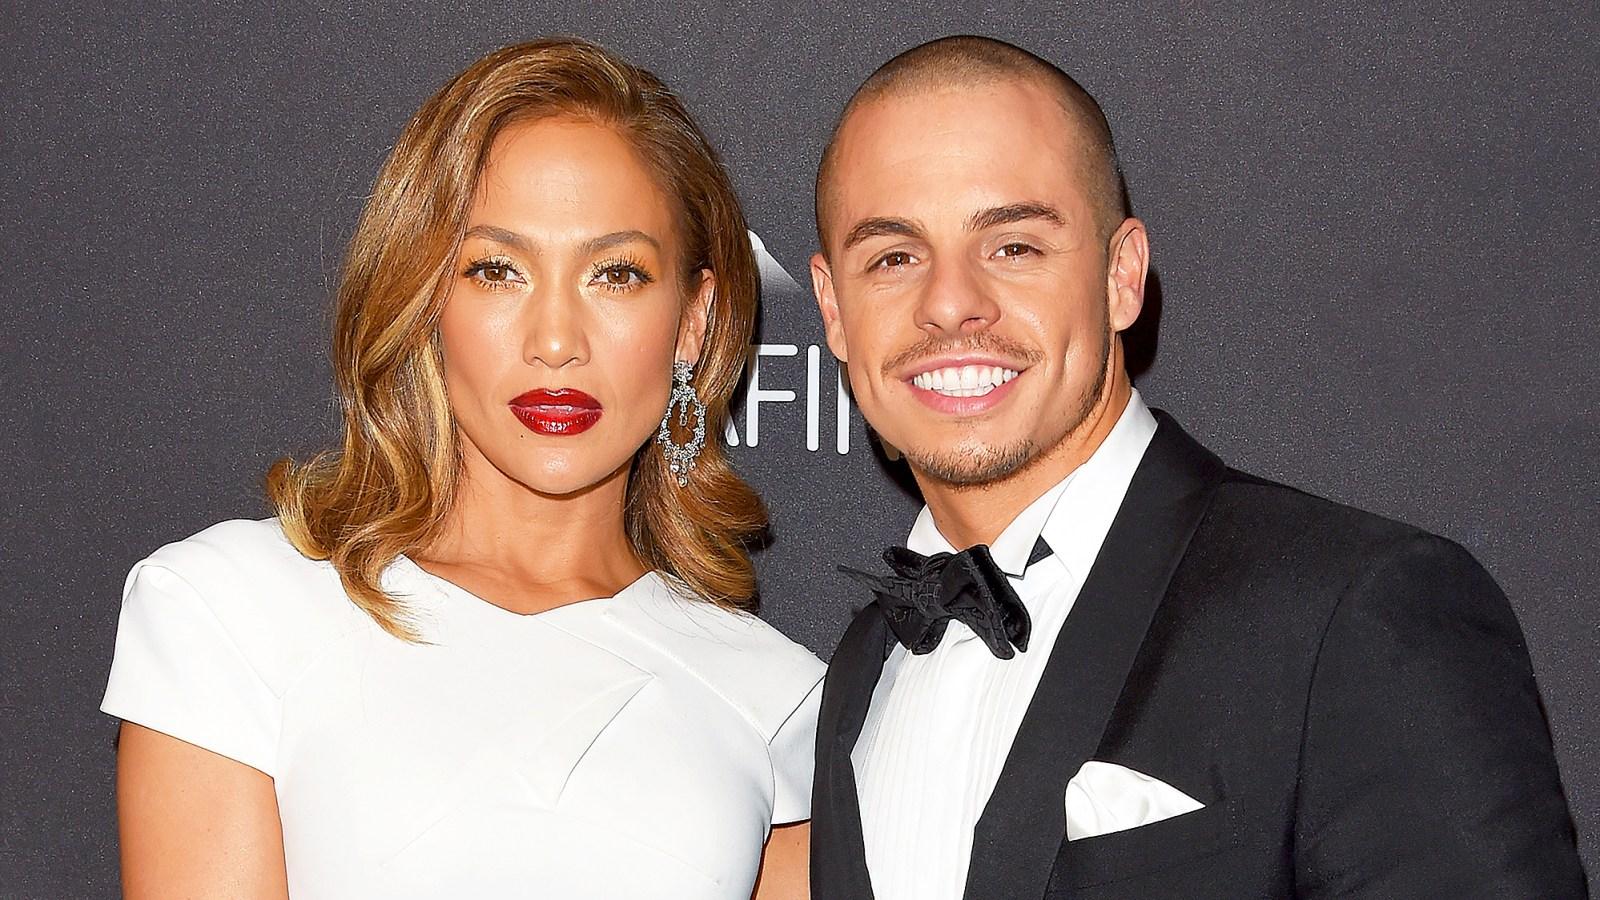 f795eecb43a Beau 'Casper' Smart: Ex Jennifer Lopez Is 'Phenomenal,' We're Still Friends